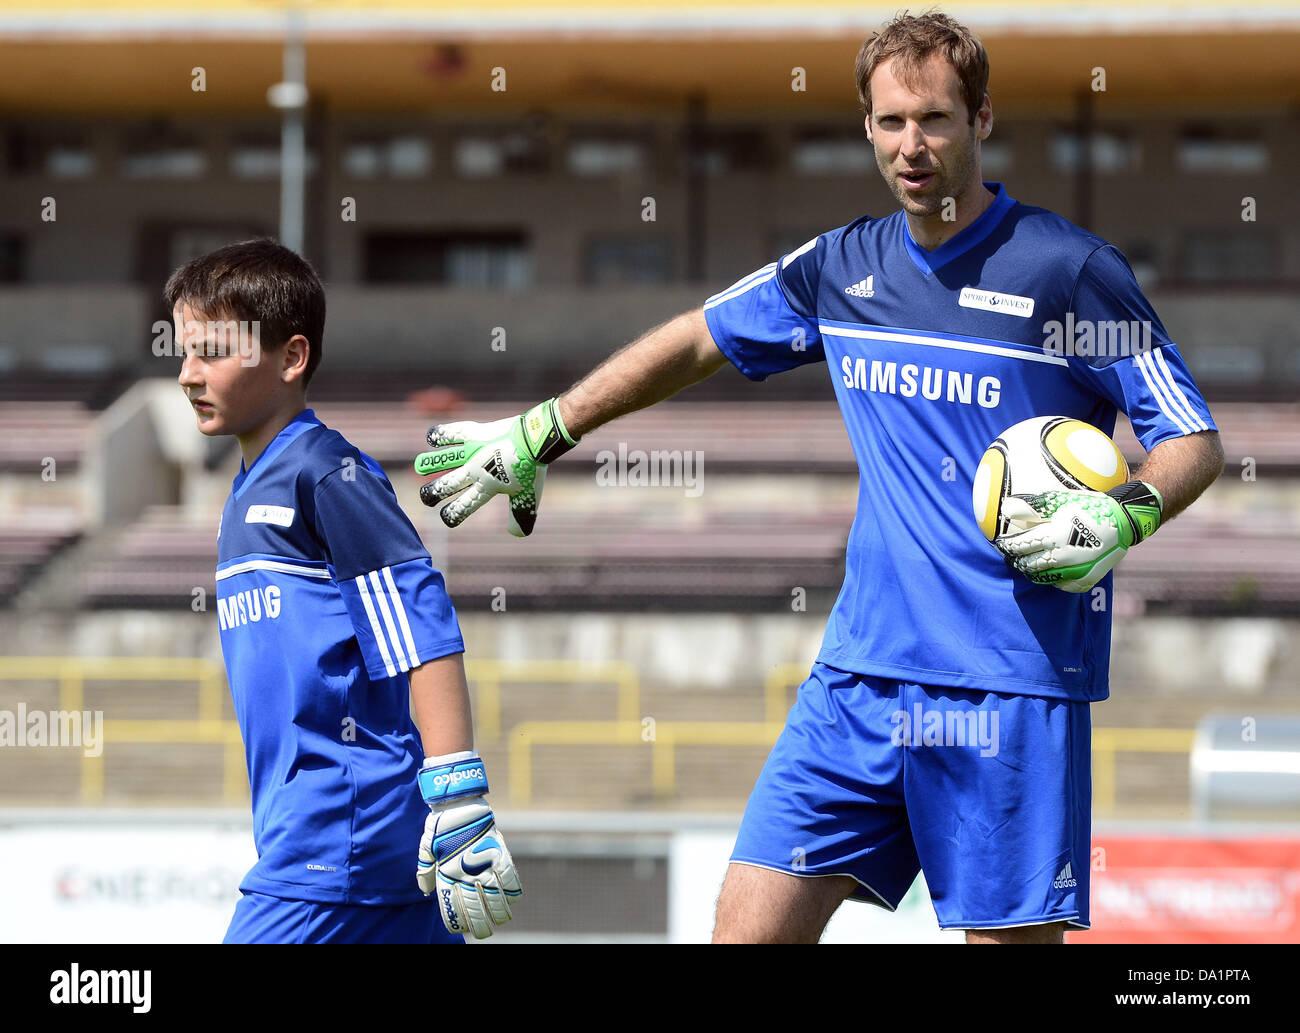 Prague Czech Republic 1st July 2013 Chelsea Goalkeeper Petr Cech Stock Photo Alamy